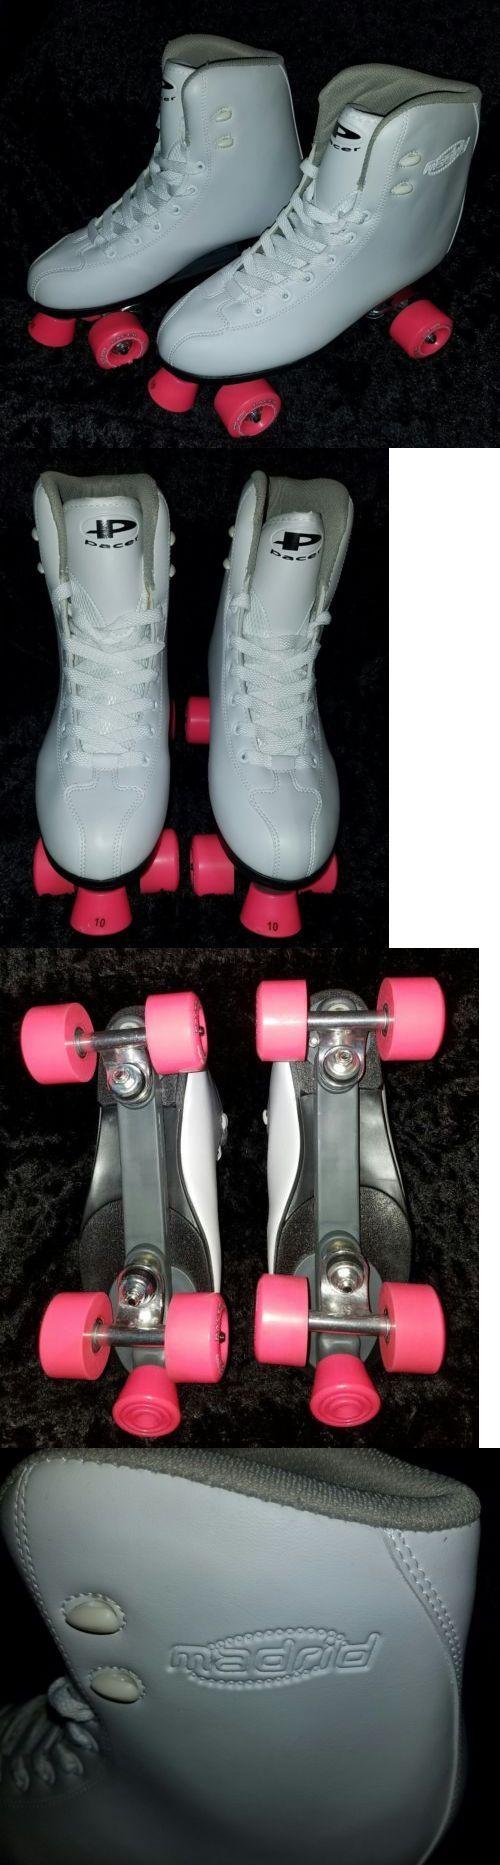 Roller skate shoes size 10 - Indoor Roller Skating 165938 New Pacer Madrid White Adult Ladies Quad Roller Skates Boots Size